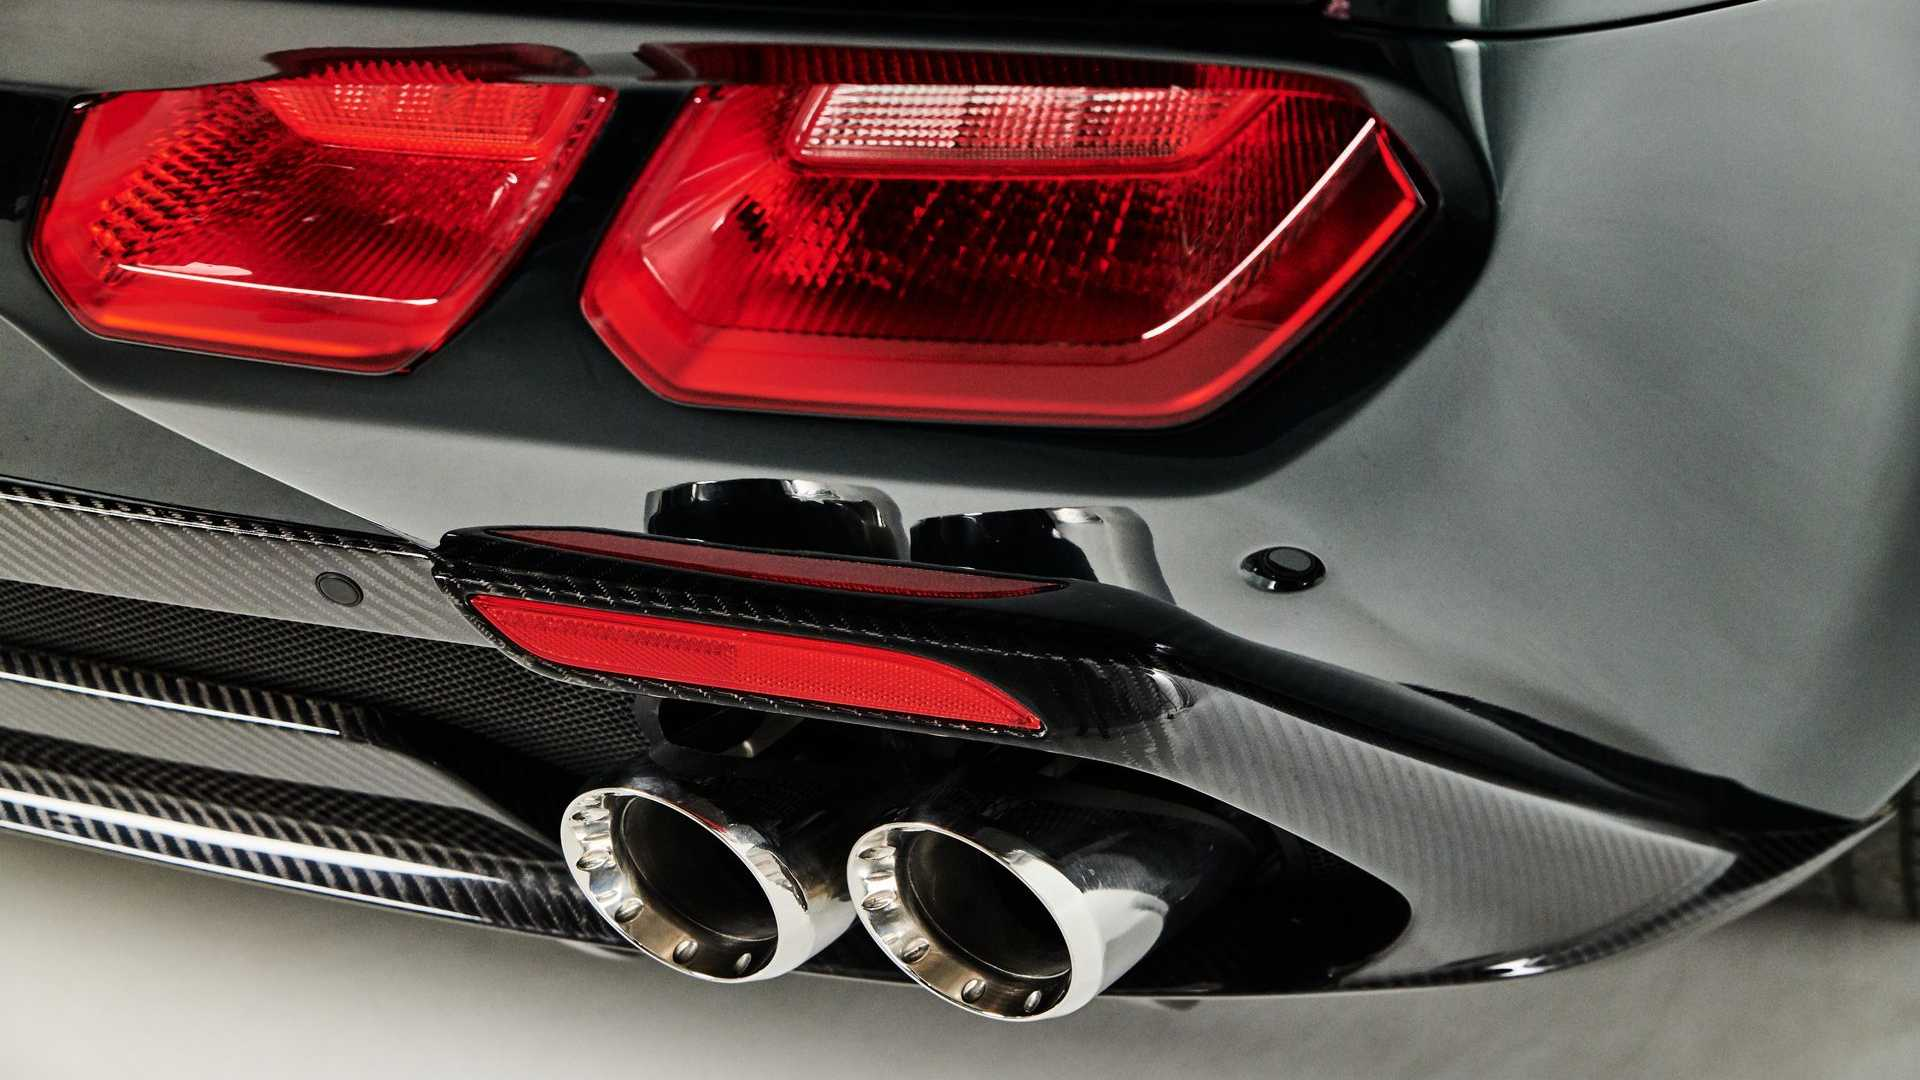 2021-ares-design-progetto-uno-exhaust